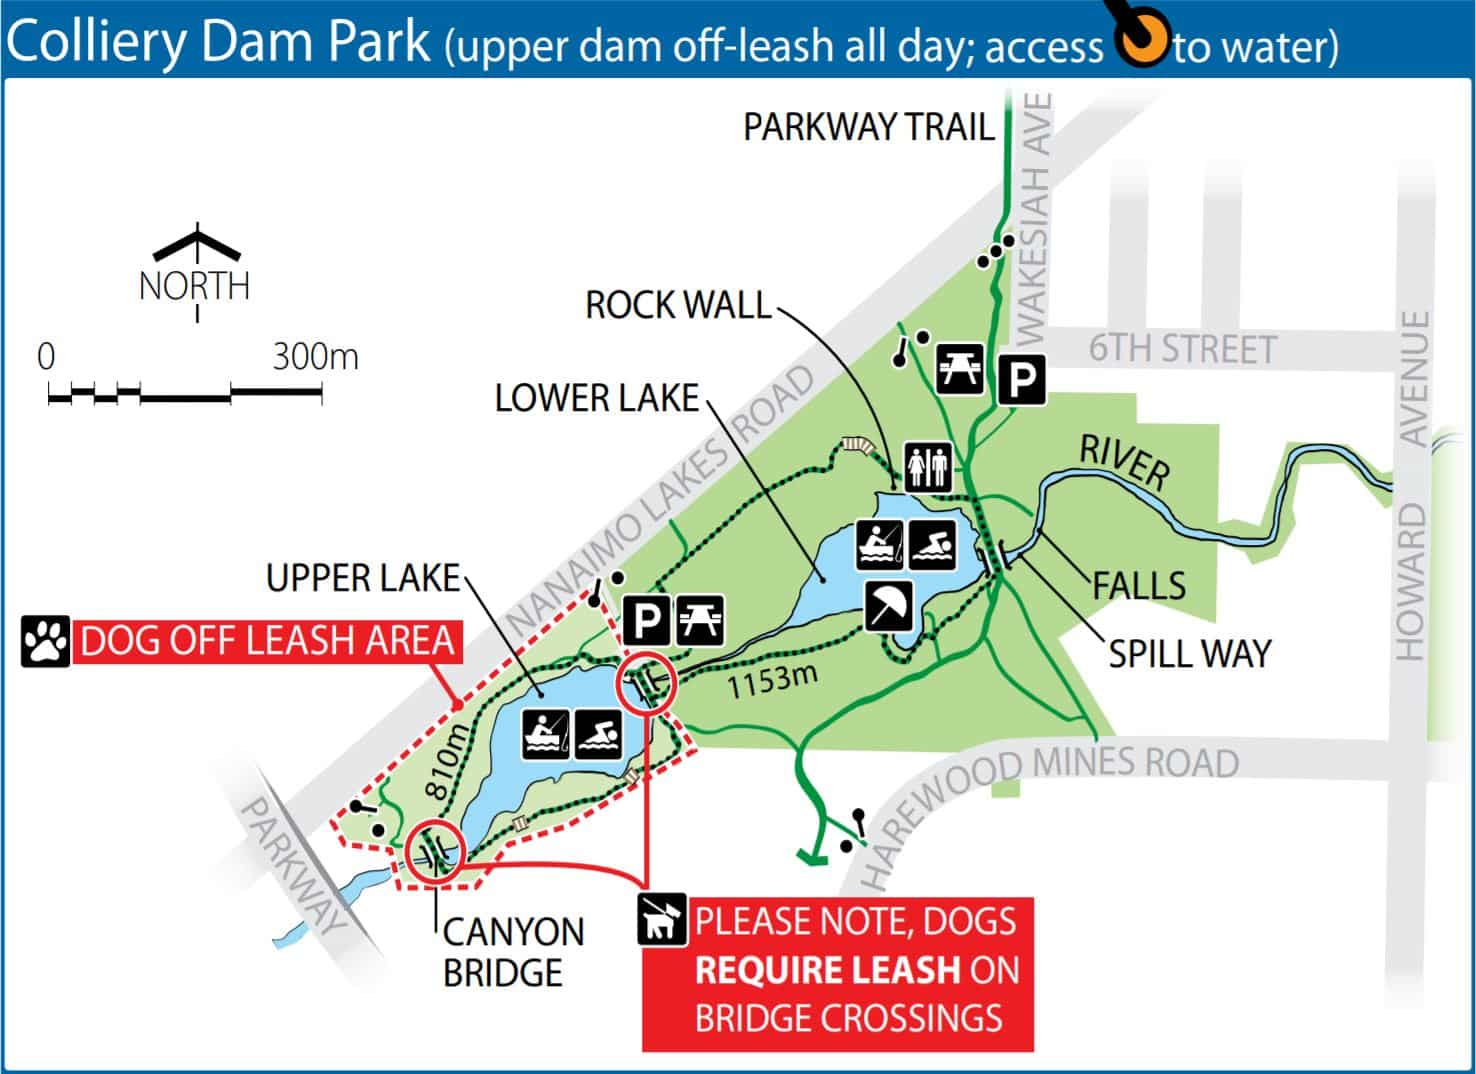 Colliery Dam Park Off-Leash Dog Park Map – Nanaimo – BC